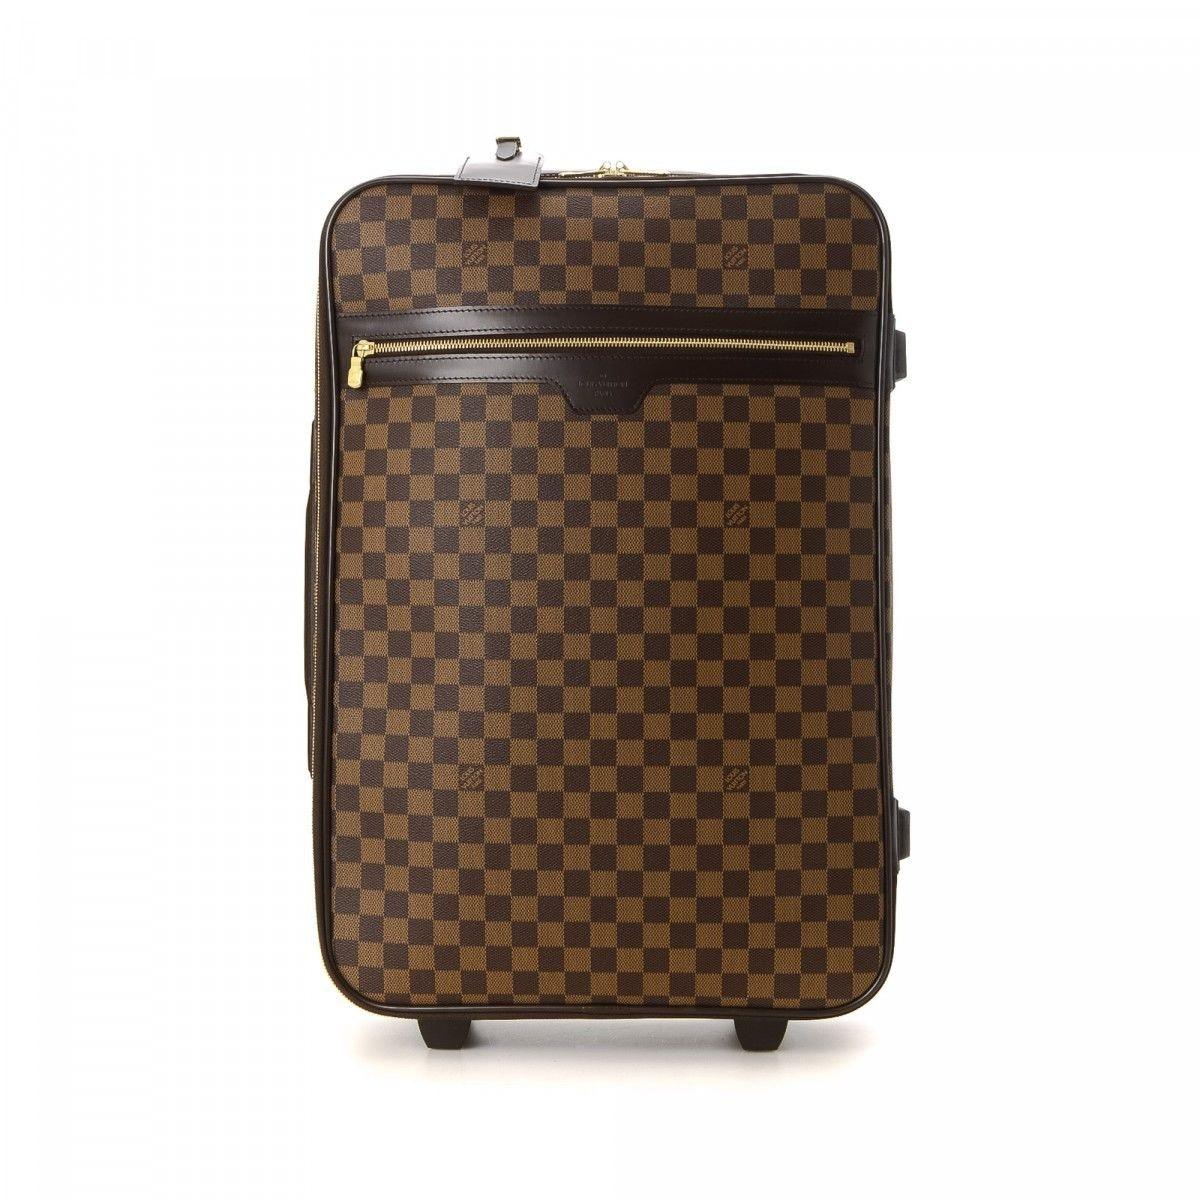 Louis Vuitton Suitcase Pegase Damier Ebene 55 Brown